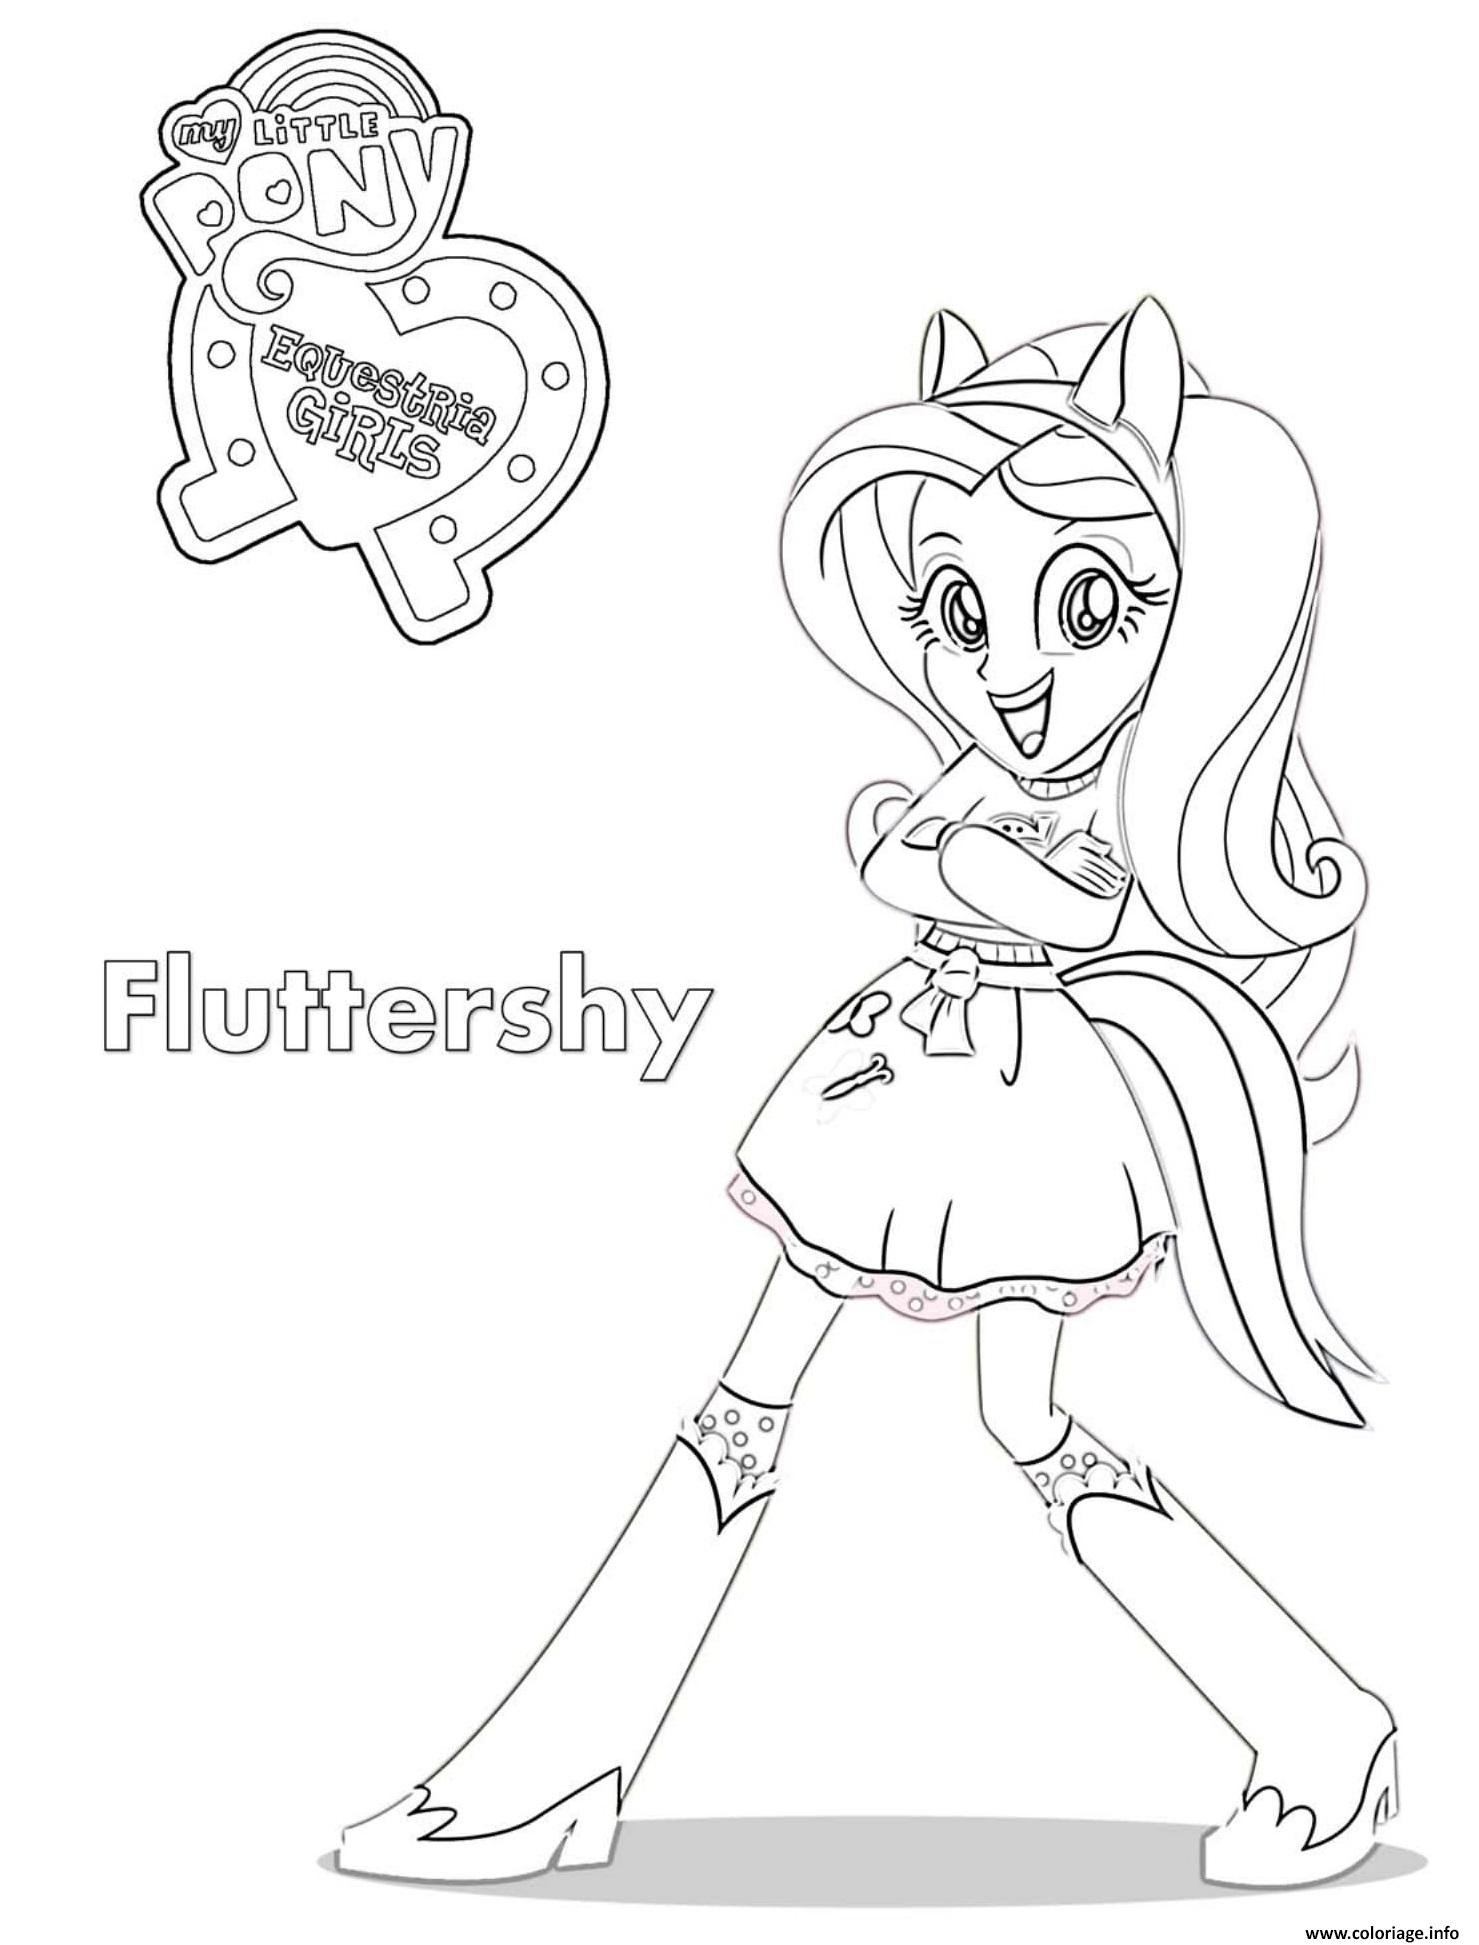 Coloriage Equestria Girls Fluttershy dessin